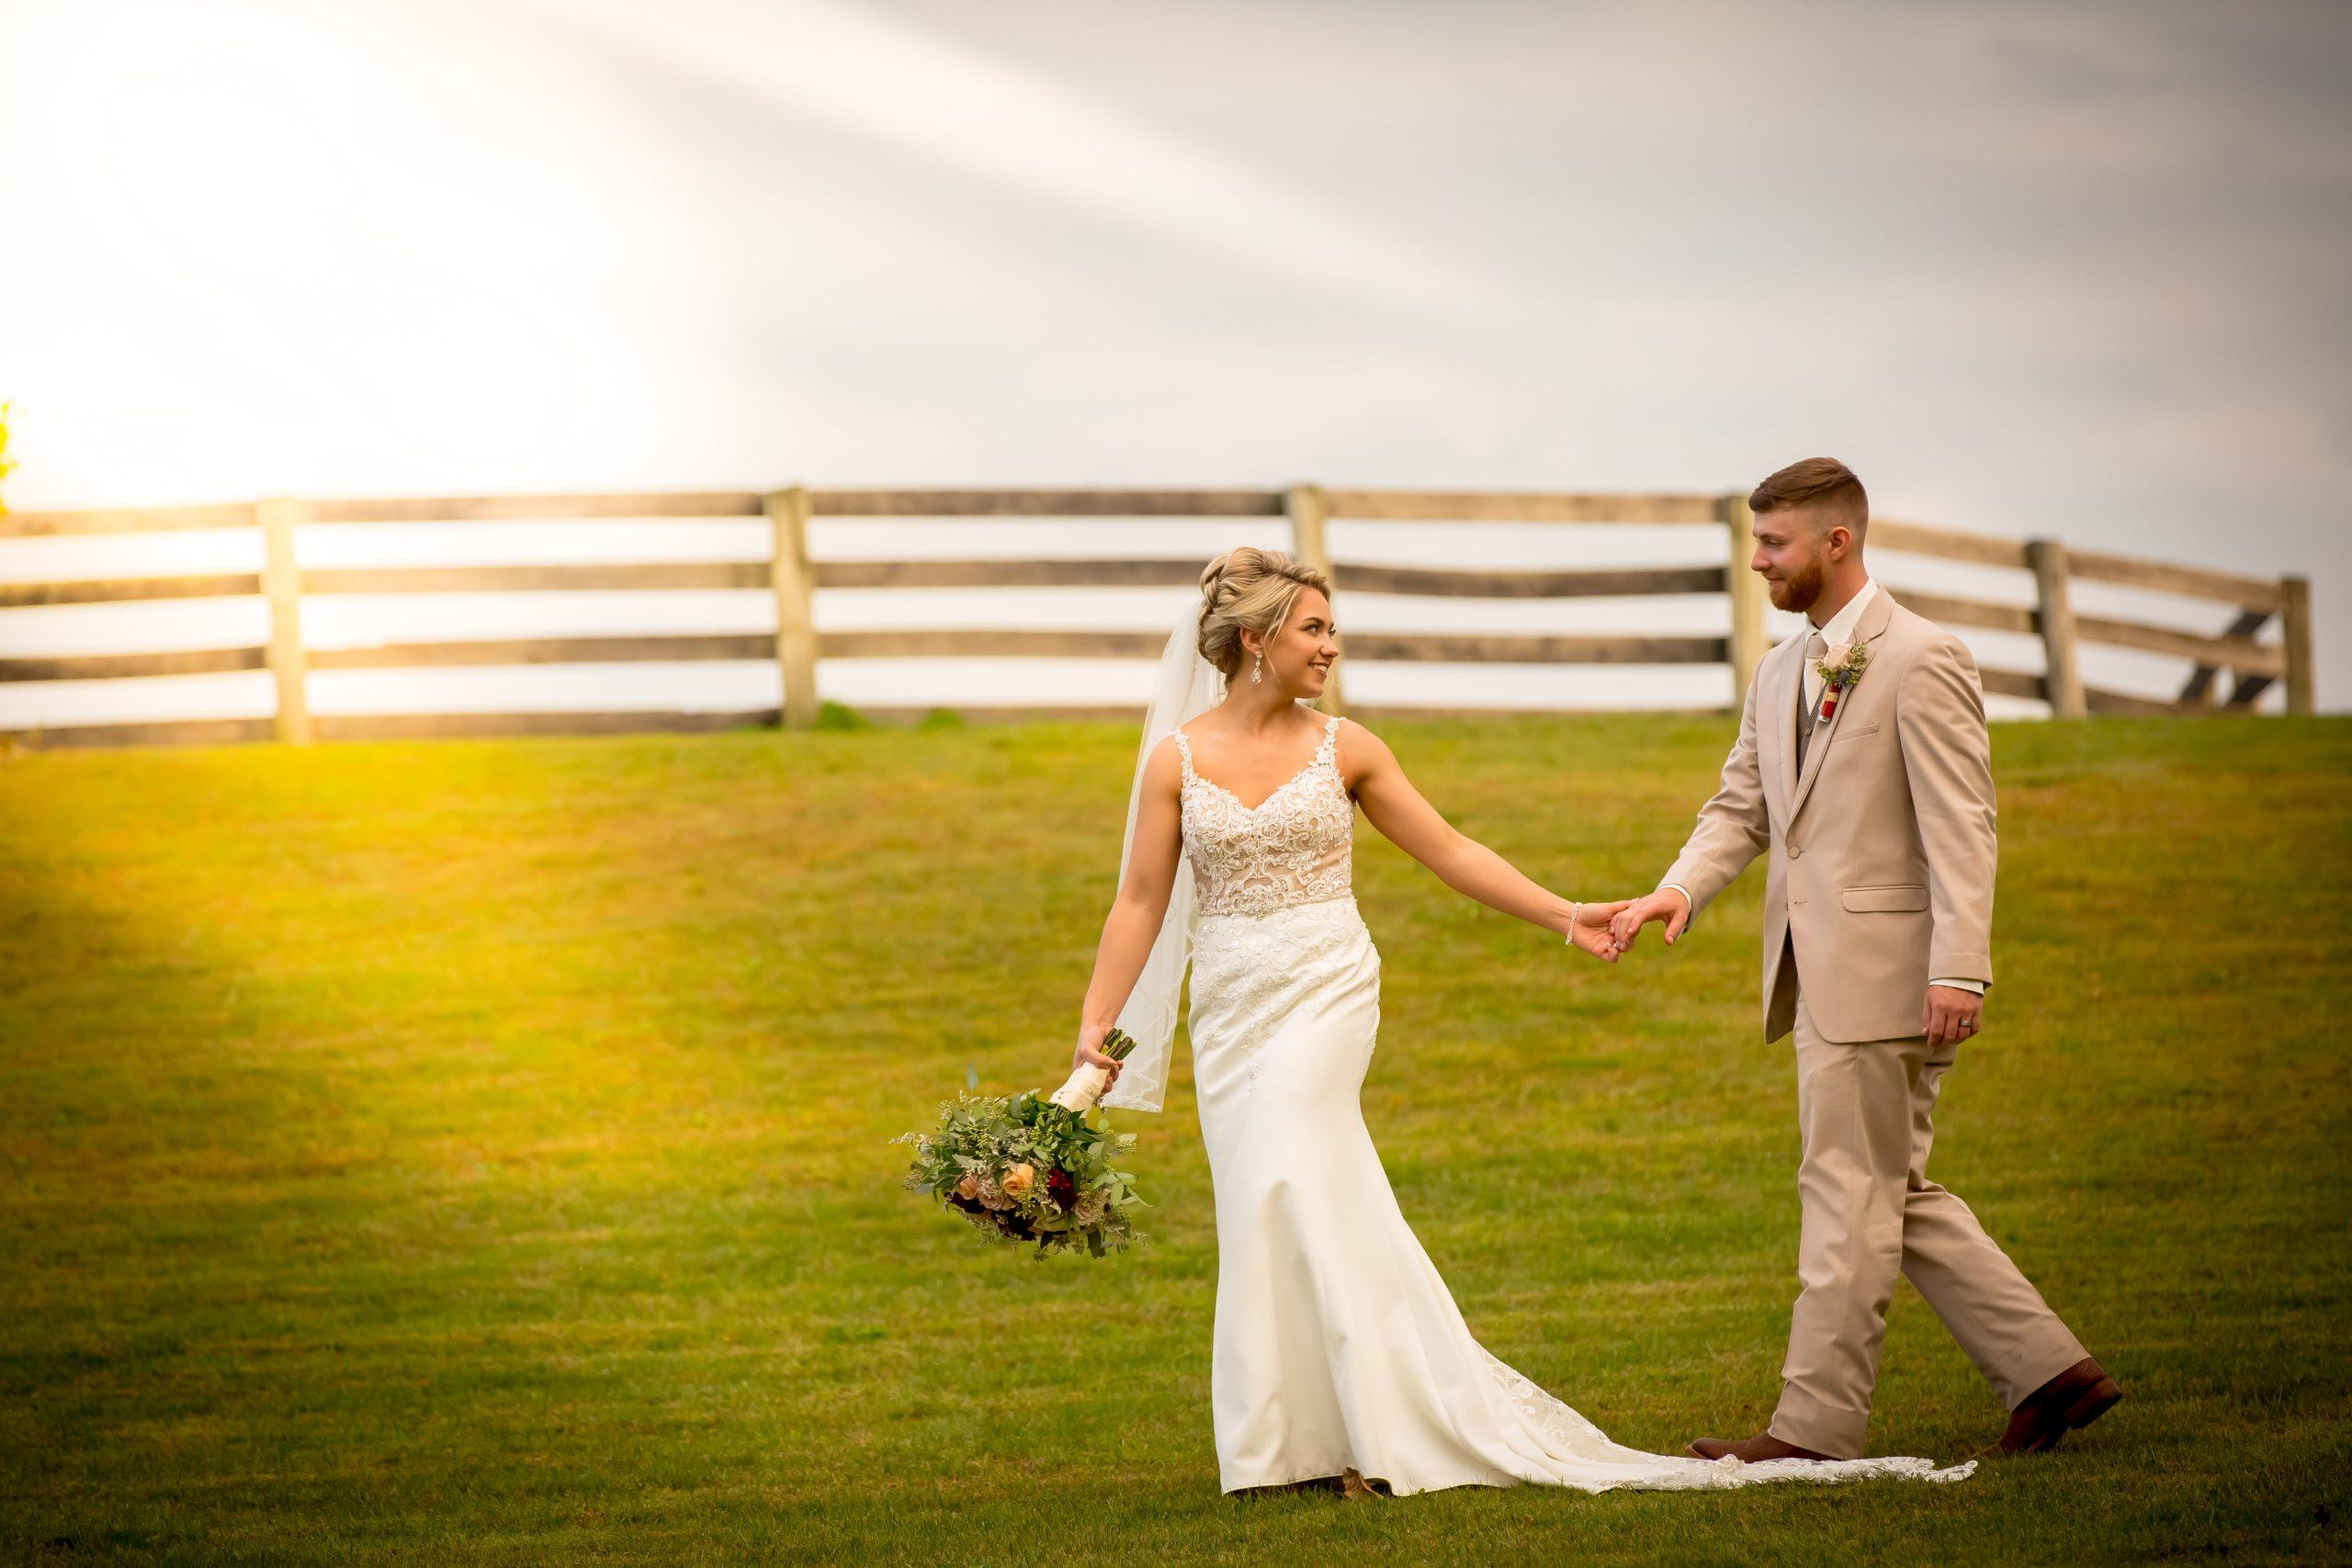 liberty_ridge_wedding18.jpg